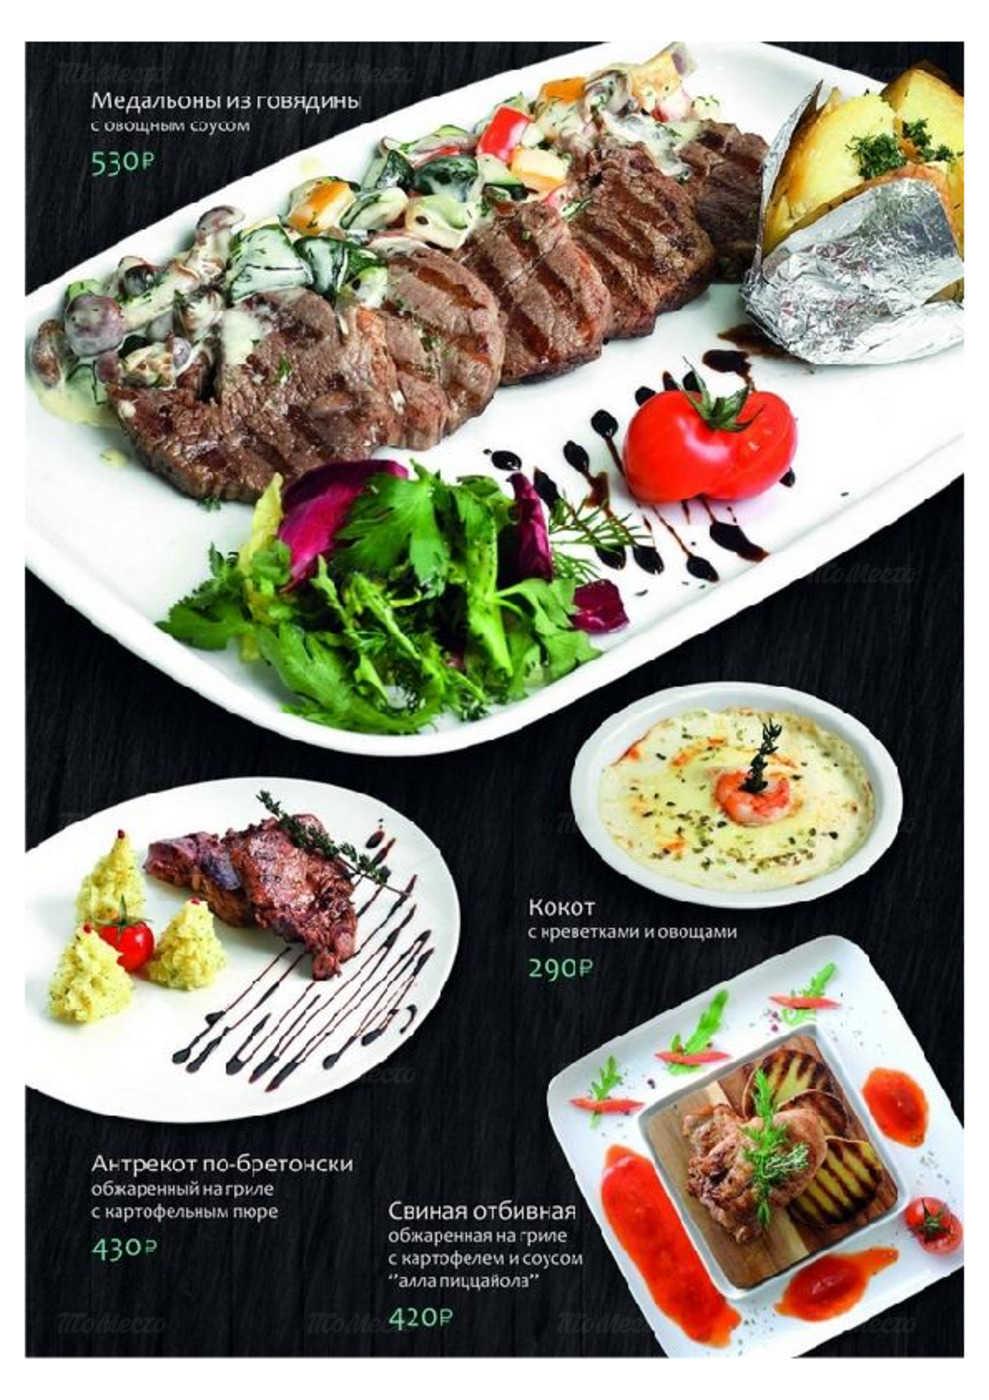 Меню ресторана Любимый Хабиб на проспекте Стачек фото 23